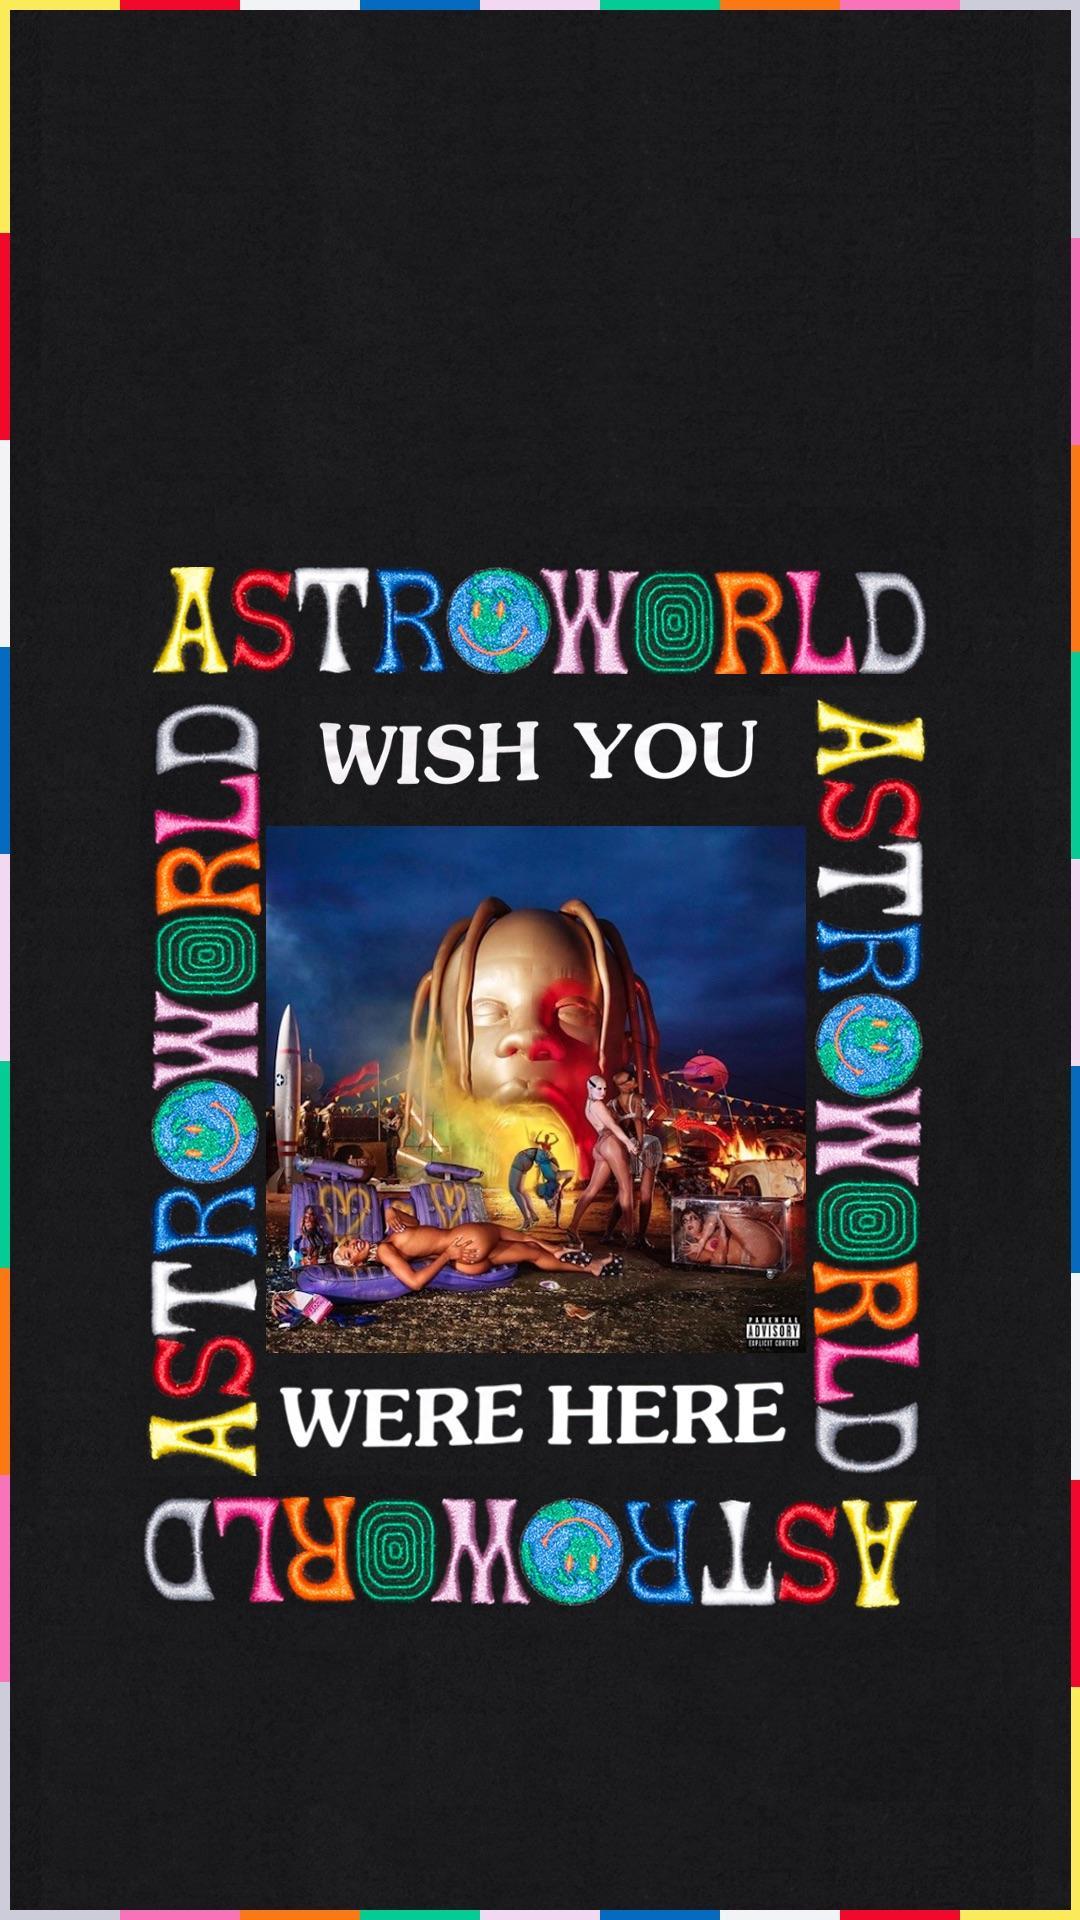 Free Download Iphone 8 Astroworld Wallpaper Travisscott 1080x1920